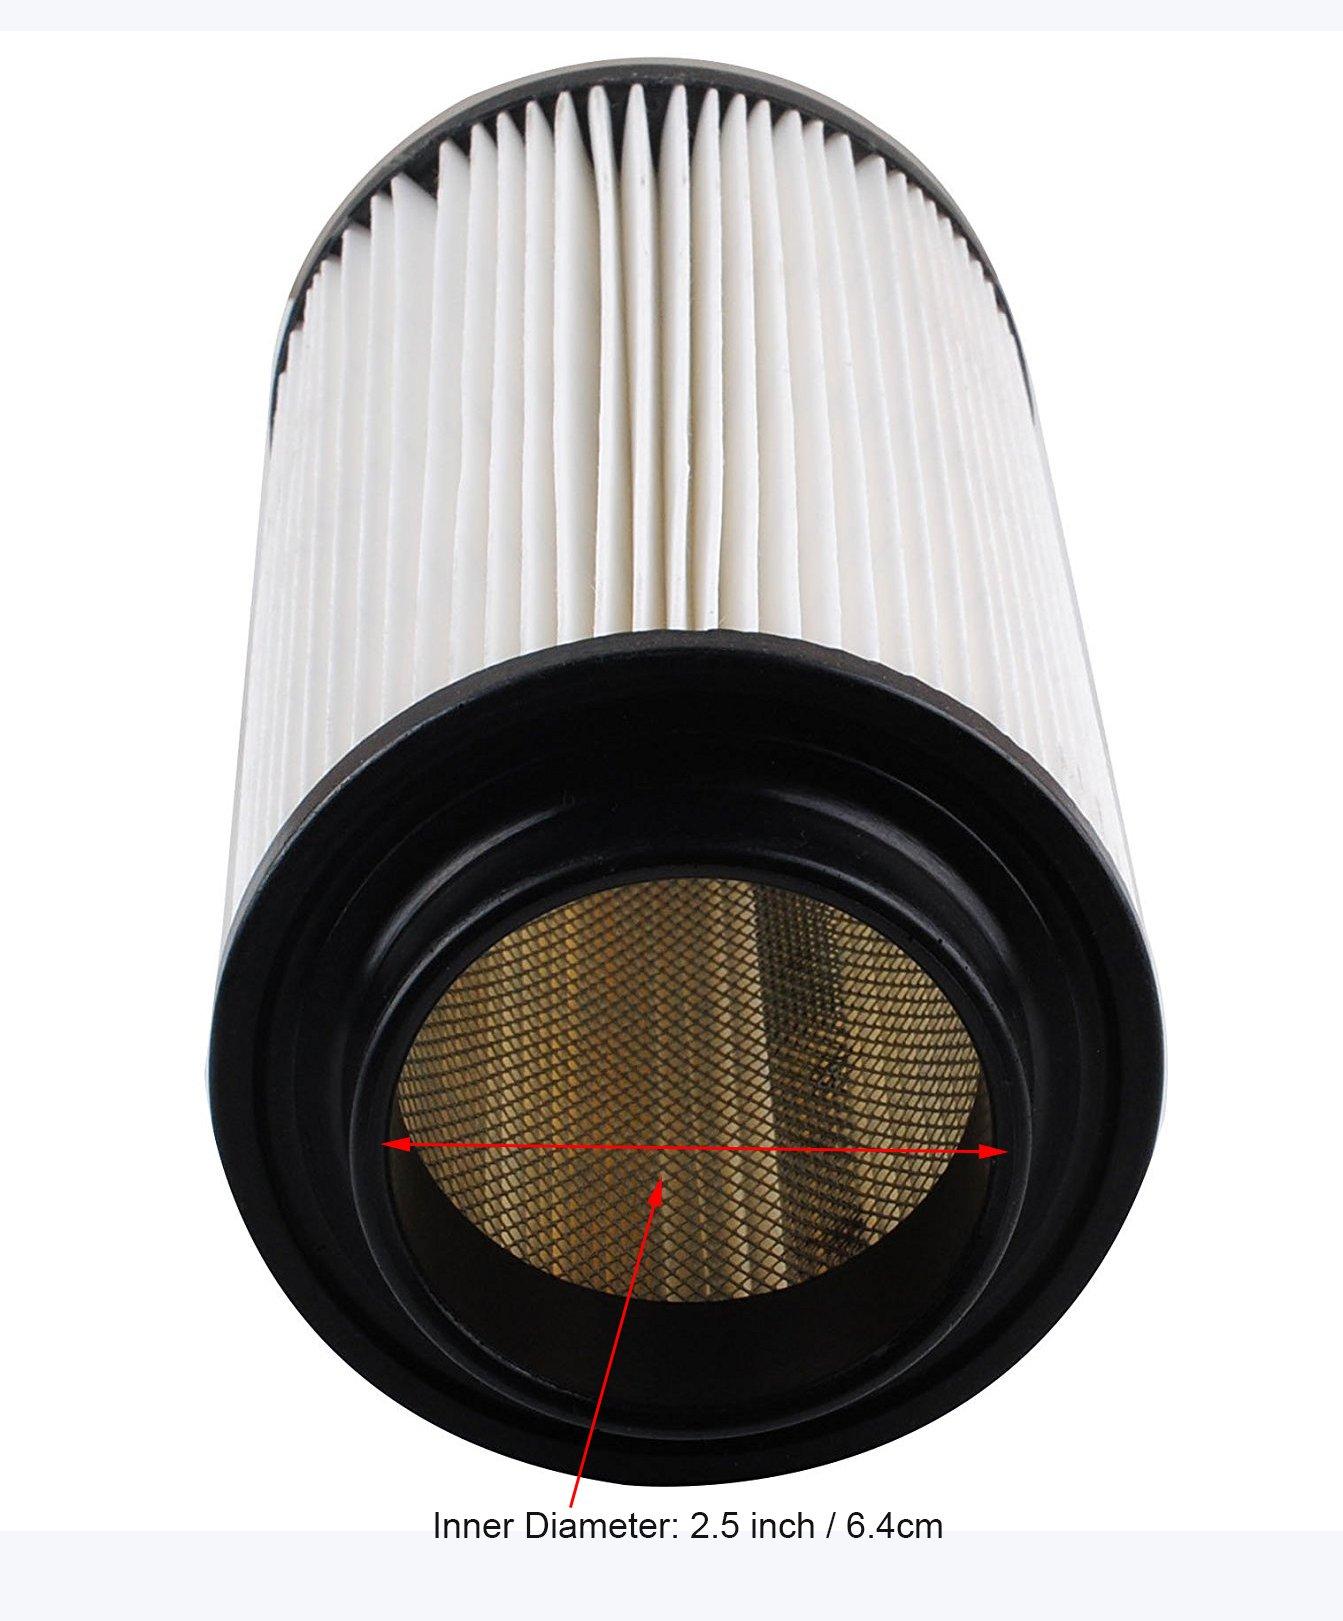 Podoy 7080595 Air filter for Polaris Sportsman Scrambler Magnum 400 500 550 570 600 700 800 850 ATV Parts by Podoy (Image #3)